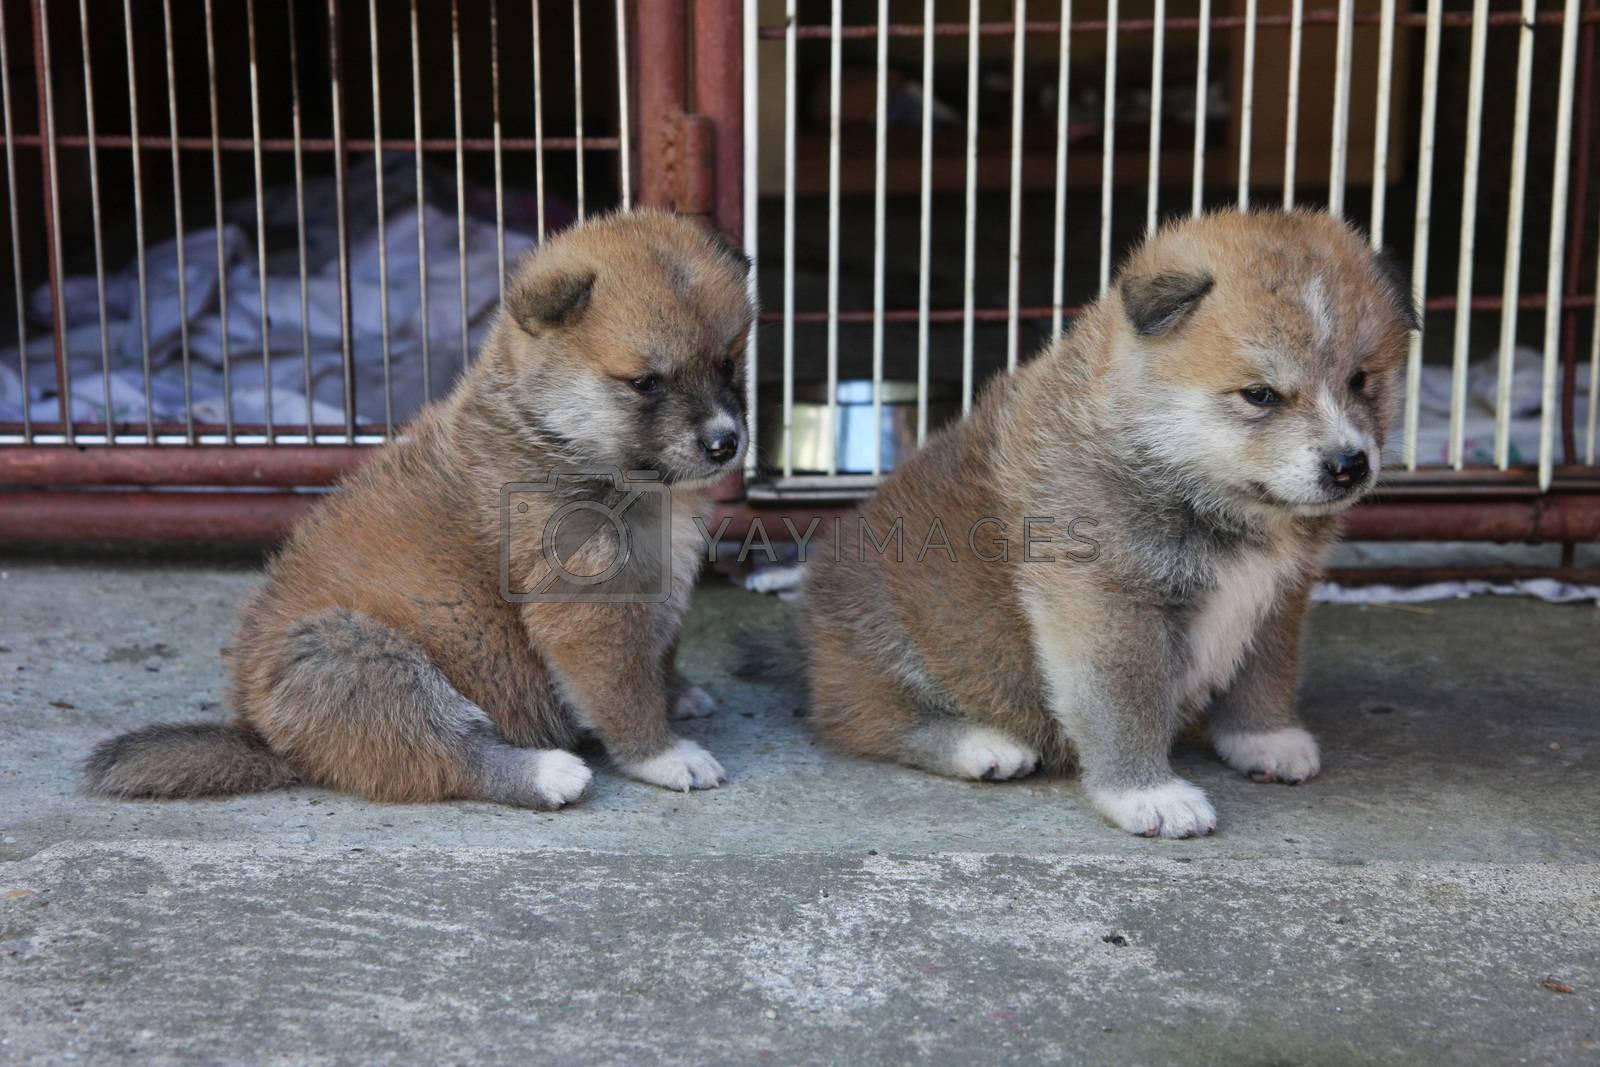 Couple of Akita Inu puppies seriously thinking